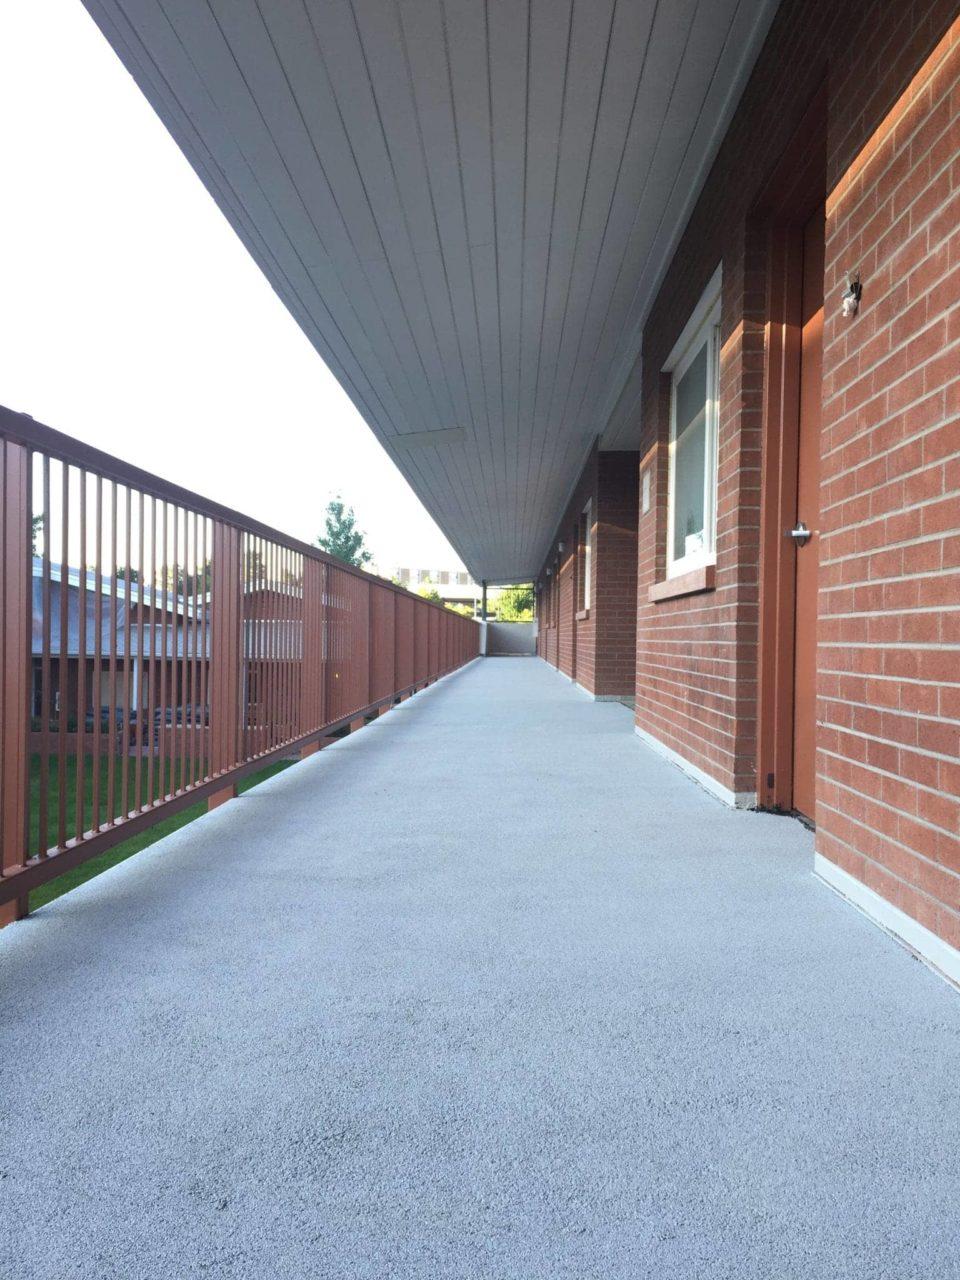 NAU McDonald Hall Elevated Walkway Hollow Core Repair